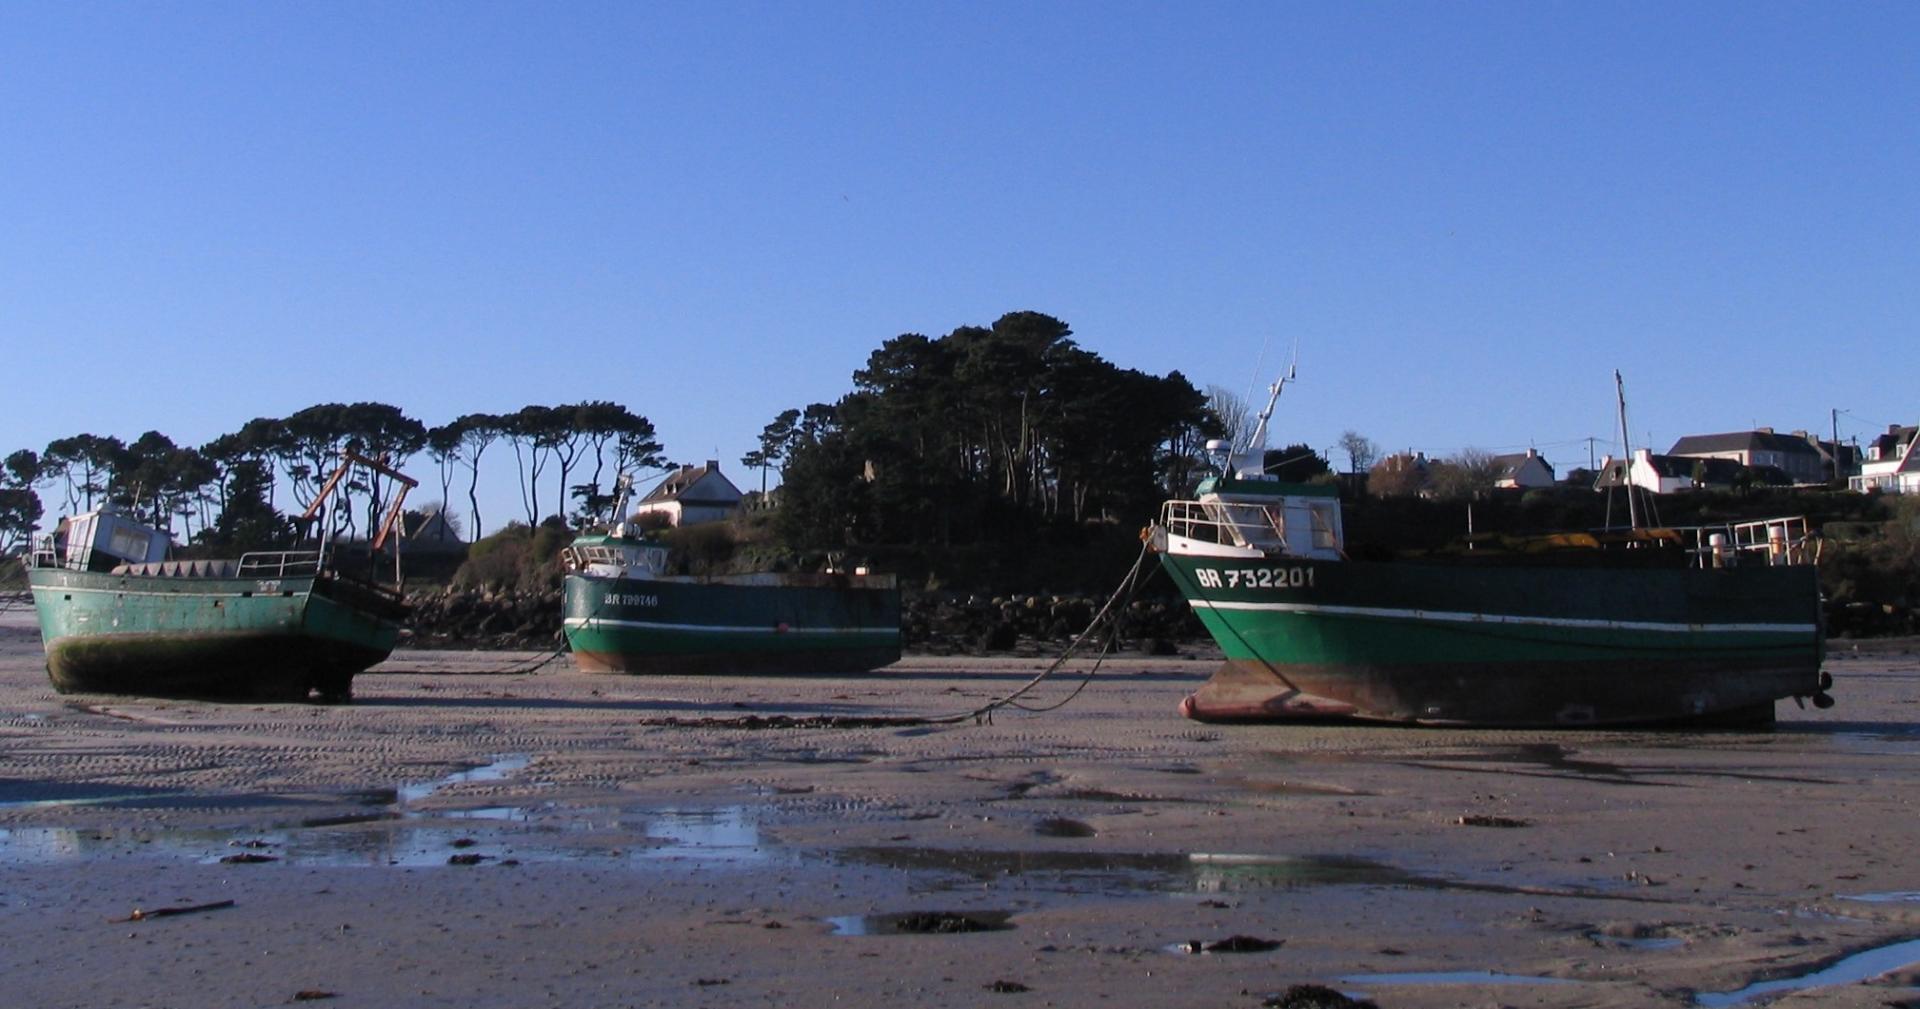 200206 flottille galliou c 2